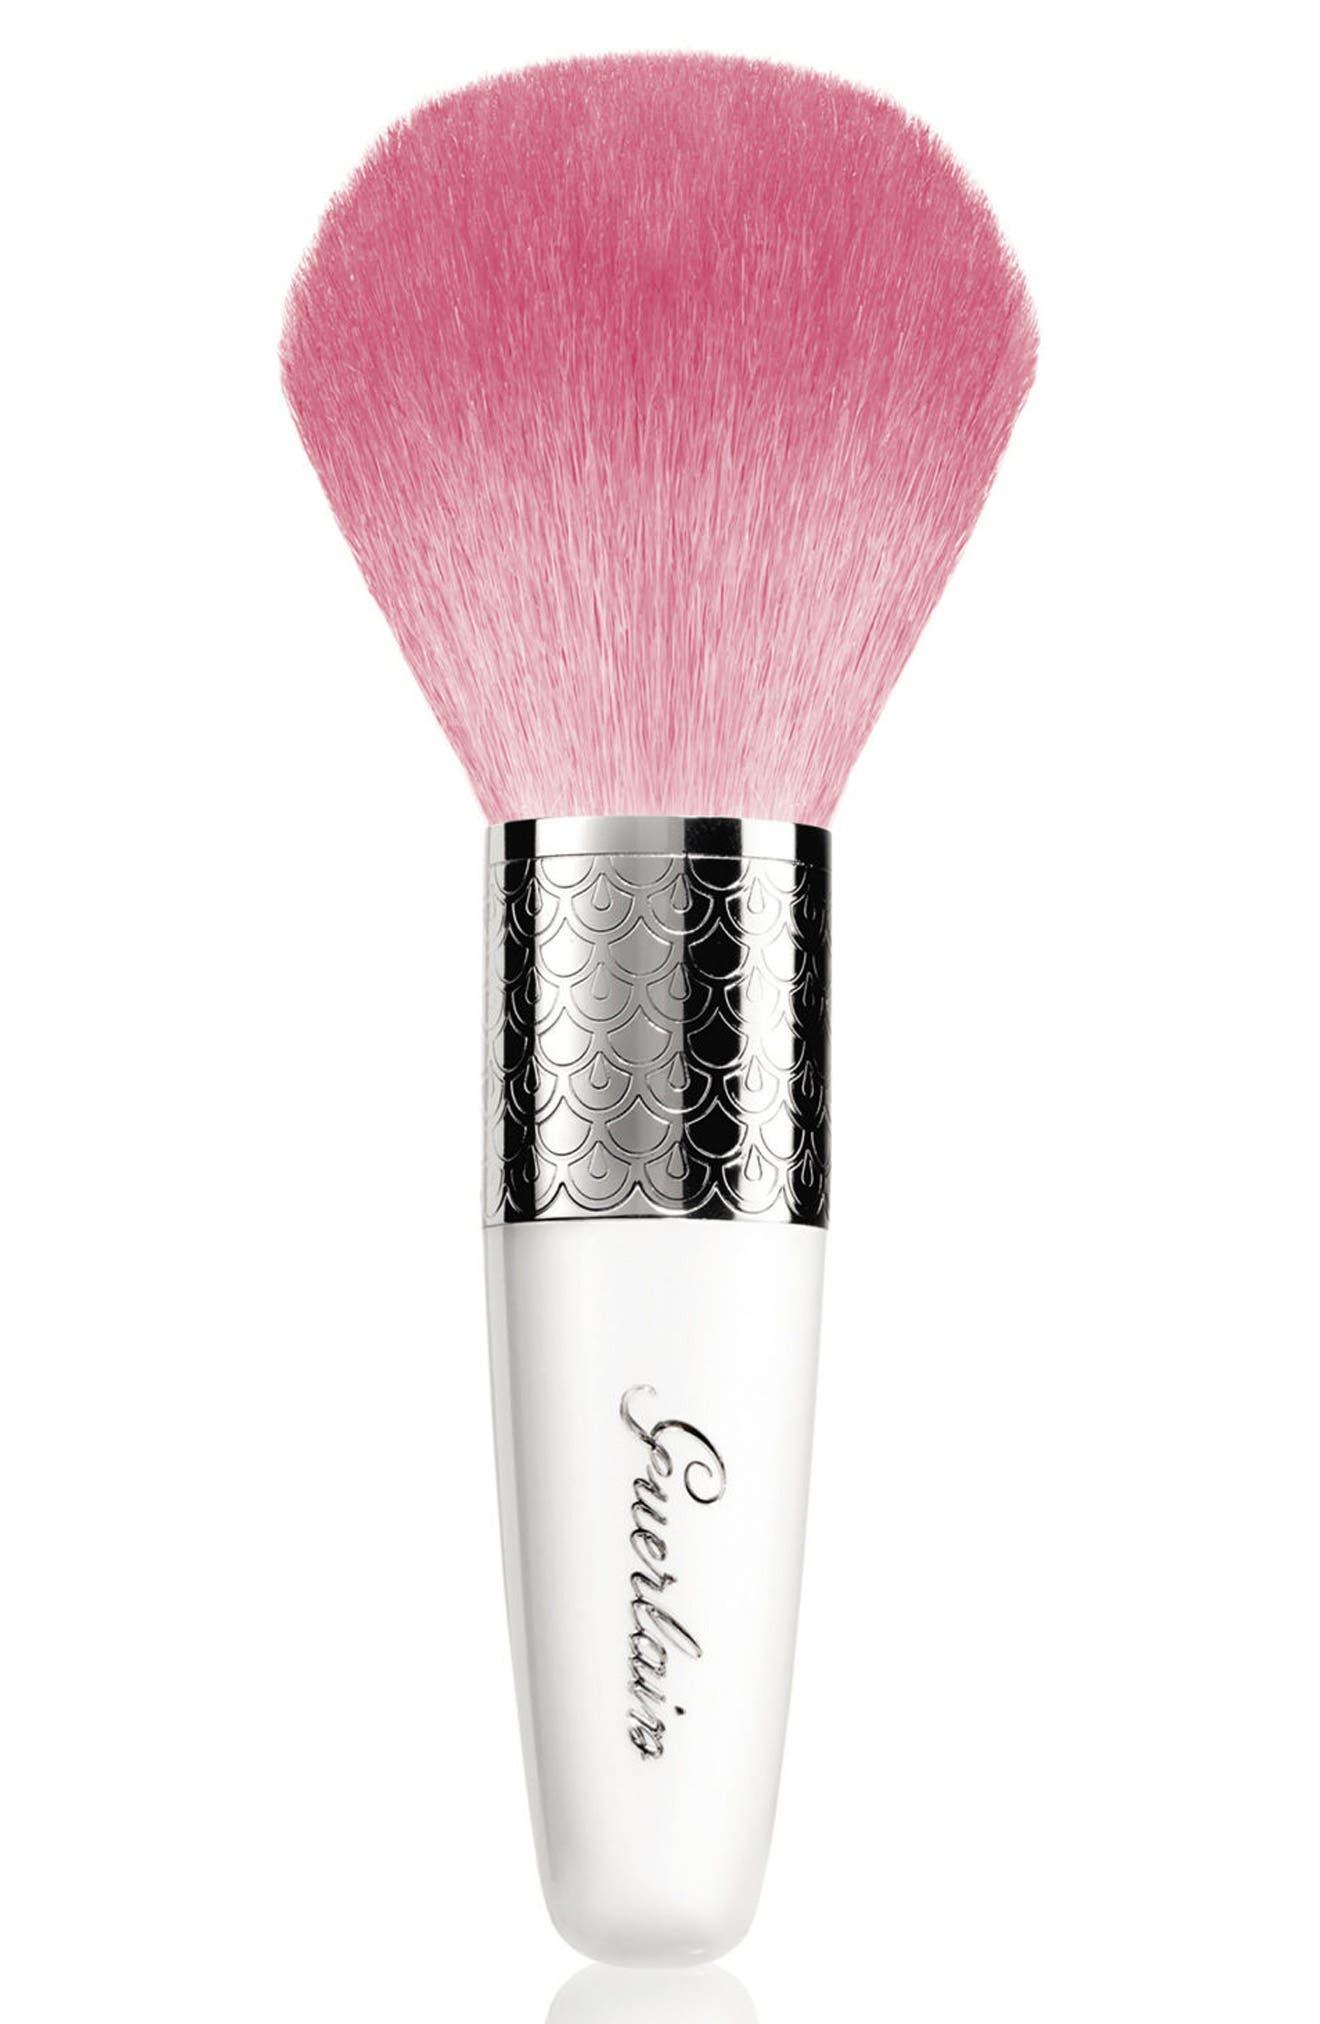 Guerlain Météorites Powder Brush